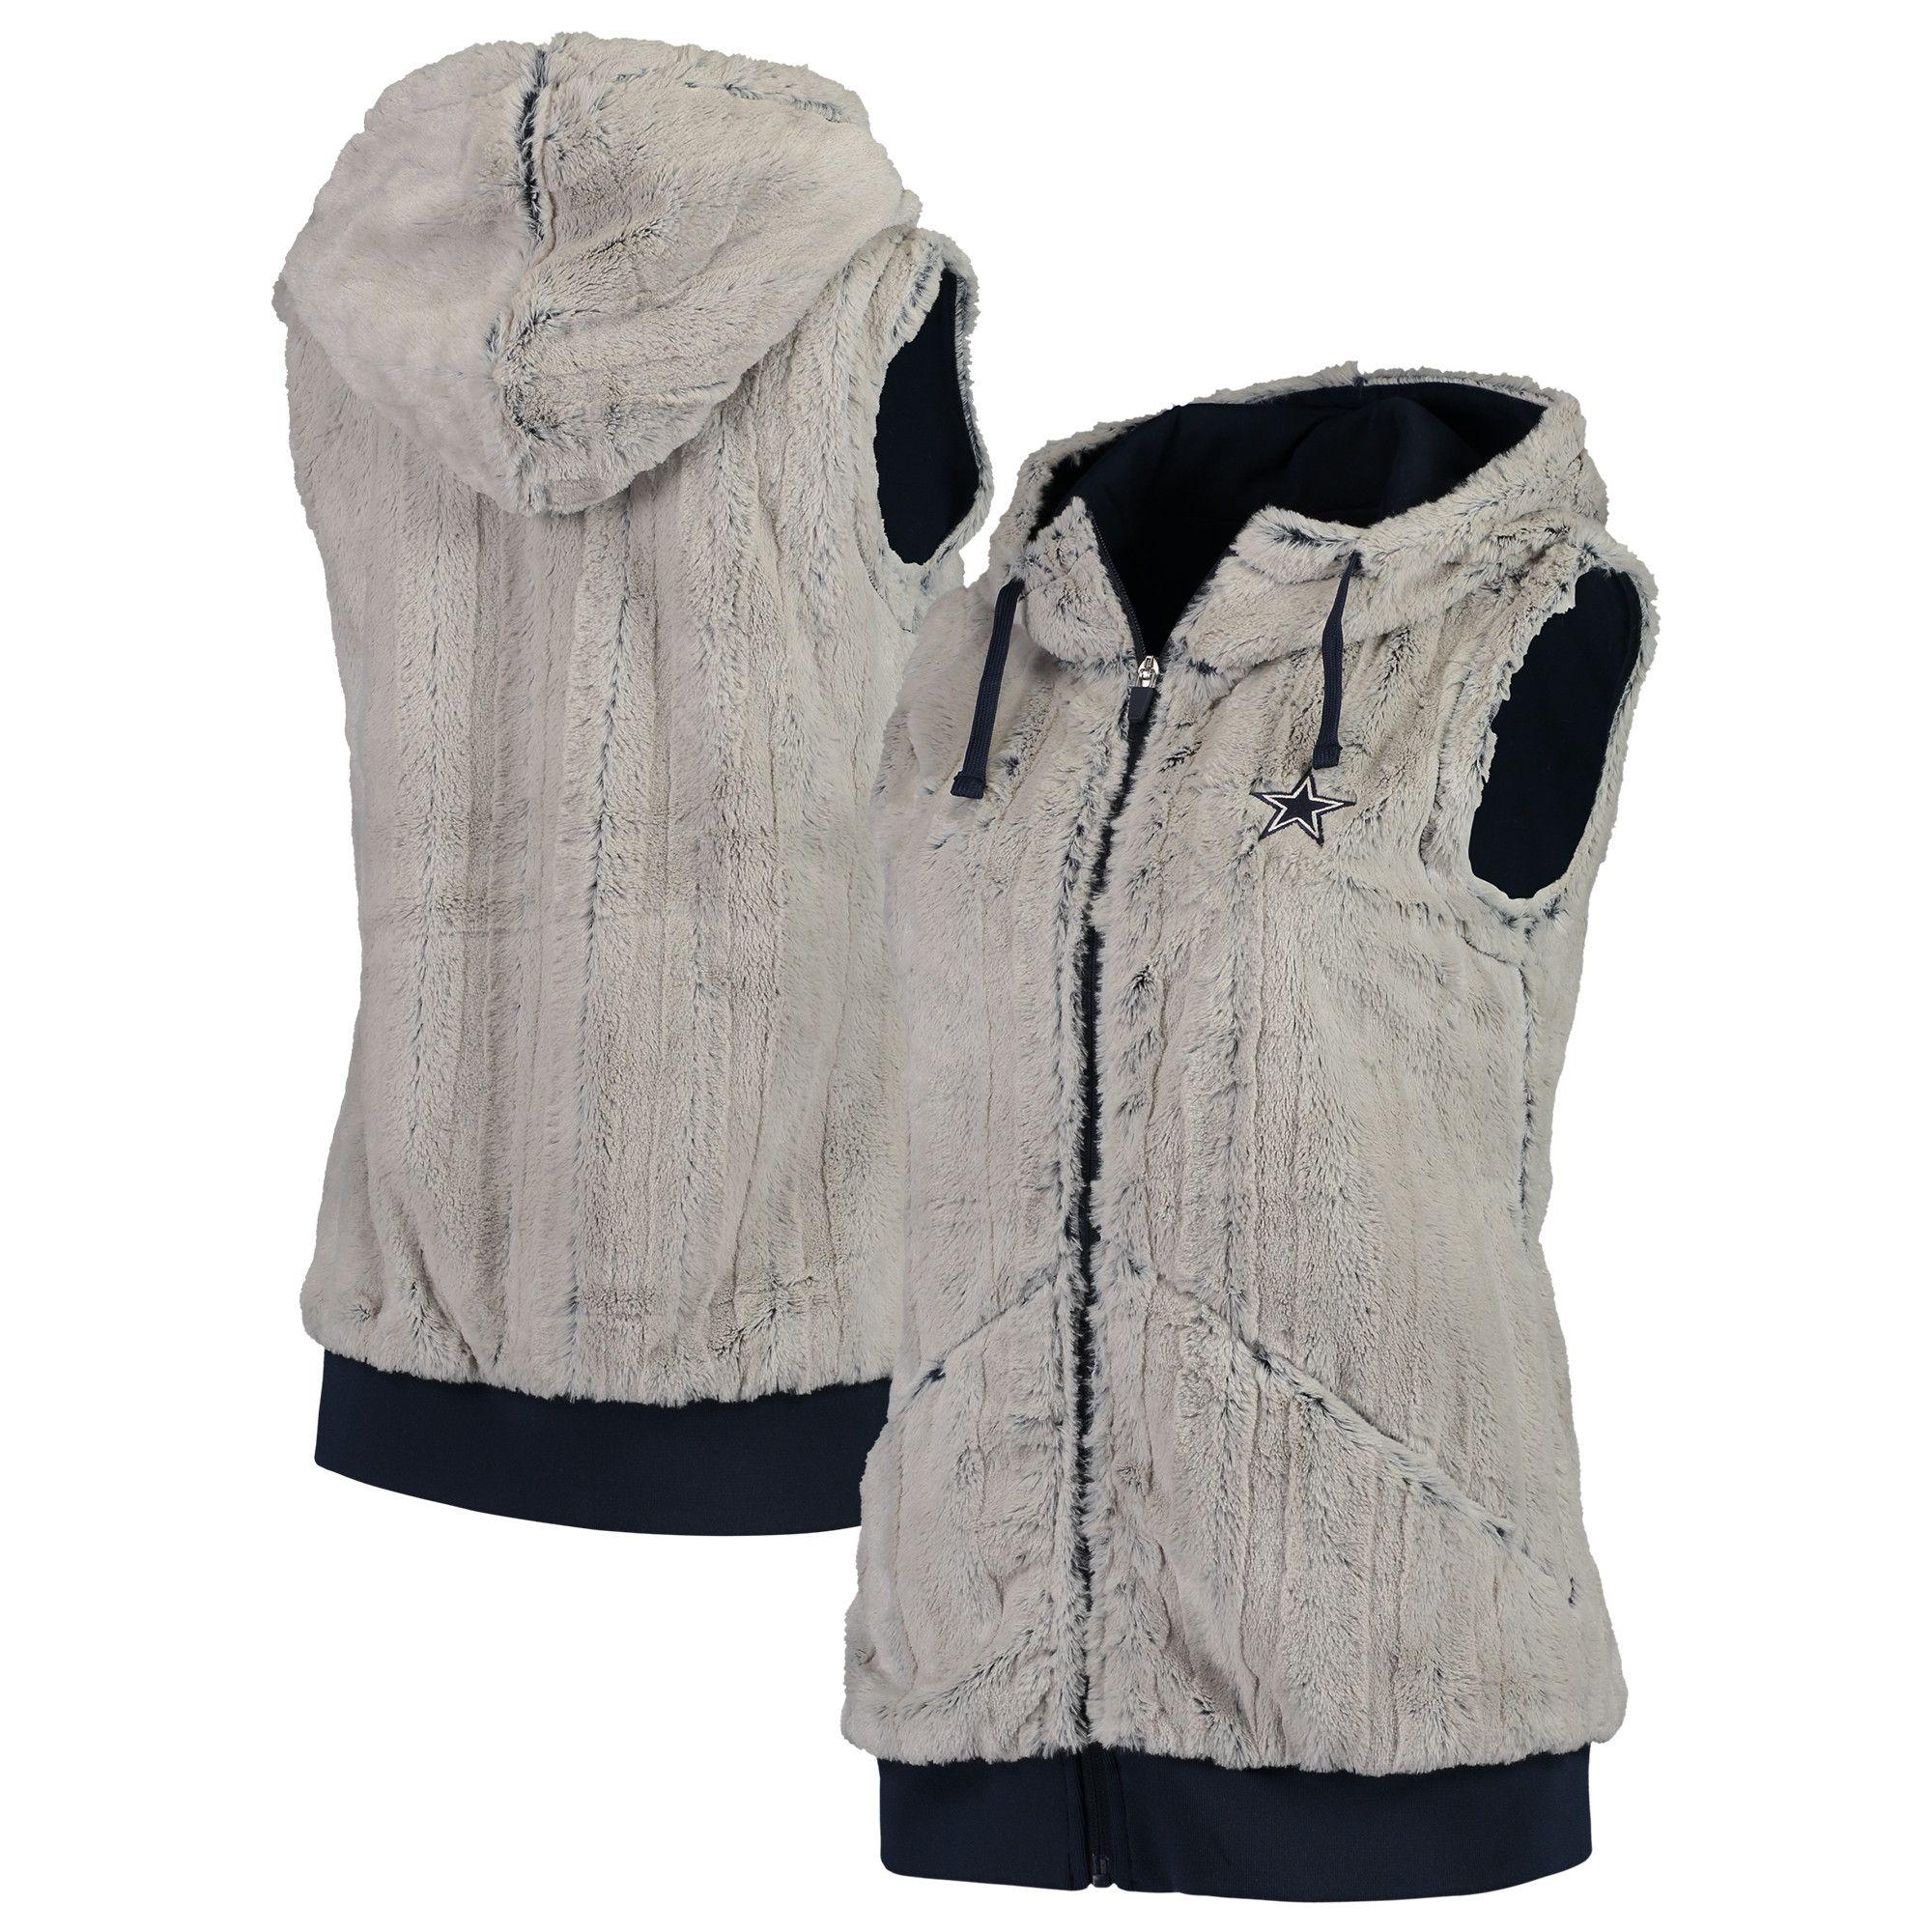 finest selection 22091 1f8dc NFL Dallas Cowboys Antigua Women's Rant Hooded Full-Zip Vest ...